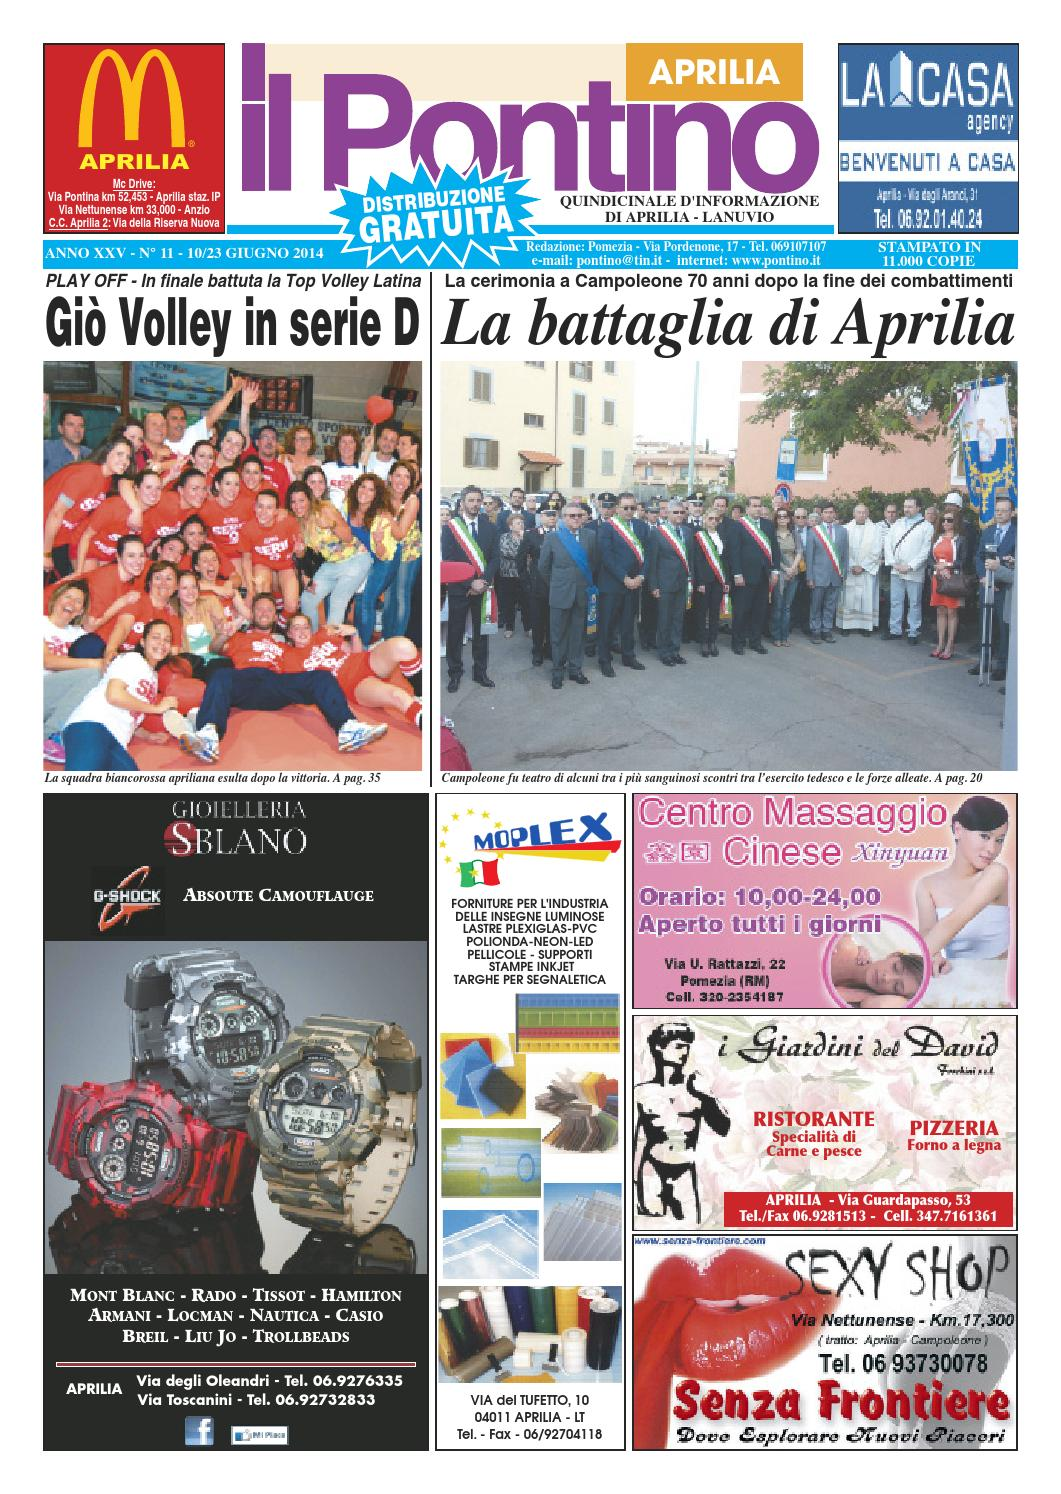 b15f78f0ab Il Pontino Aprilia n. 11 - 10/23 Giugno 2014 by Il Pontino/Il Litorale -  issuu